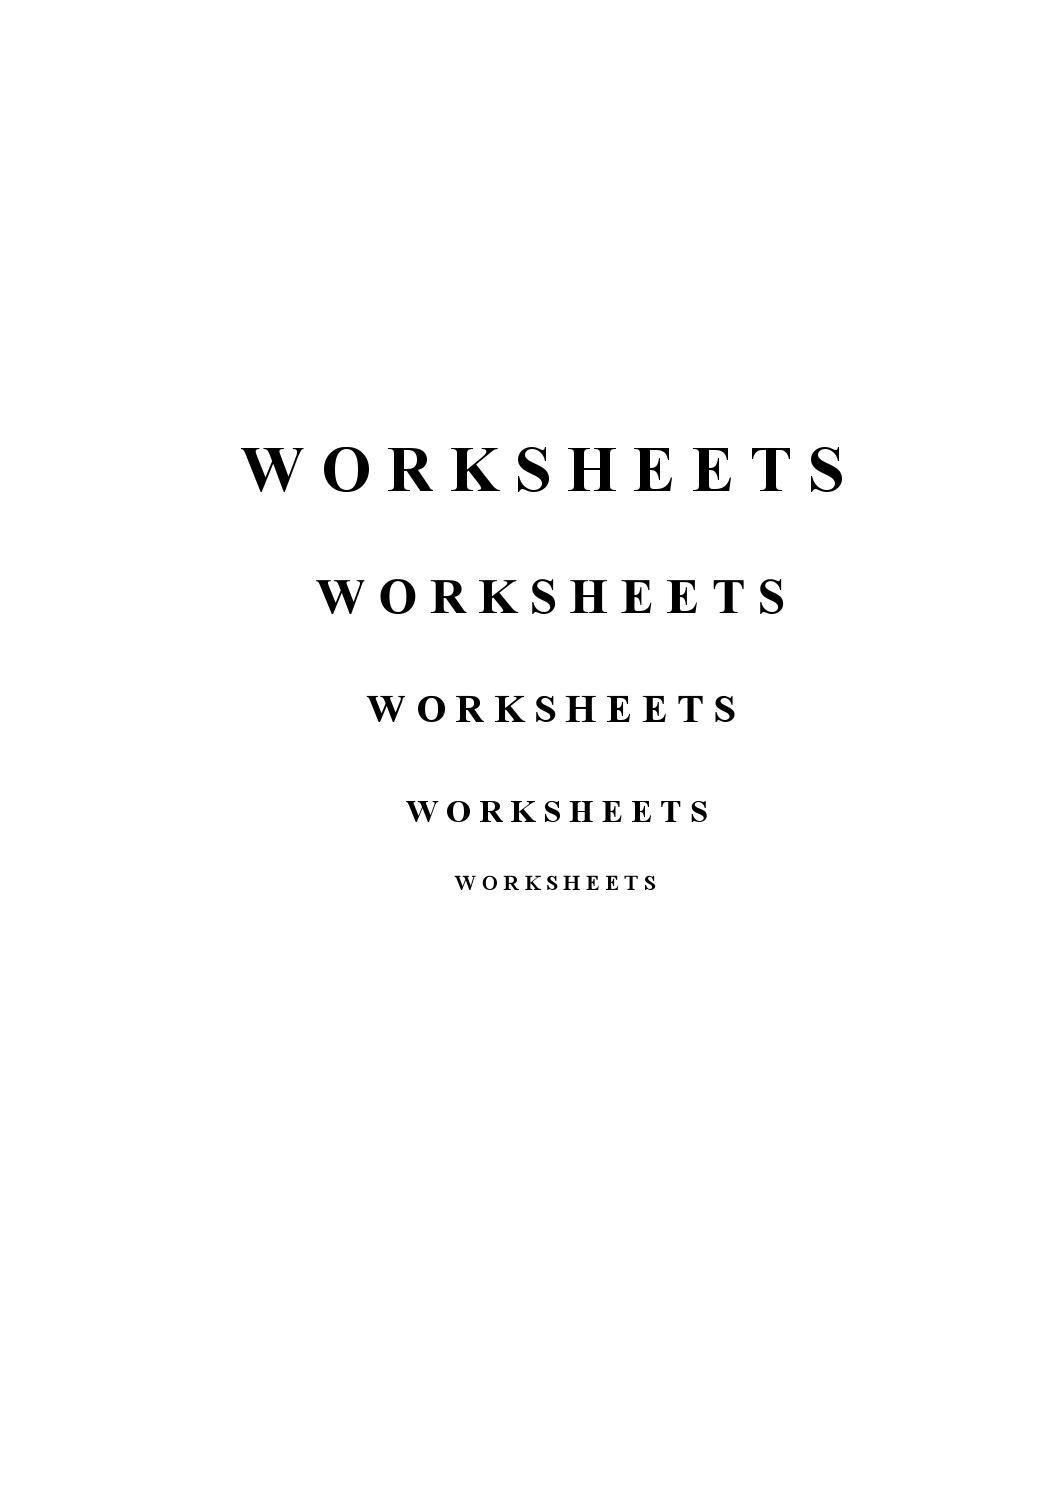 10080645 worksheets by Salima - issuu